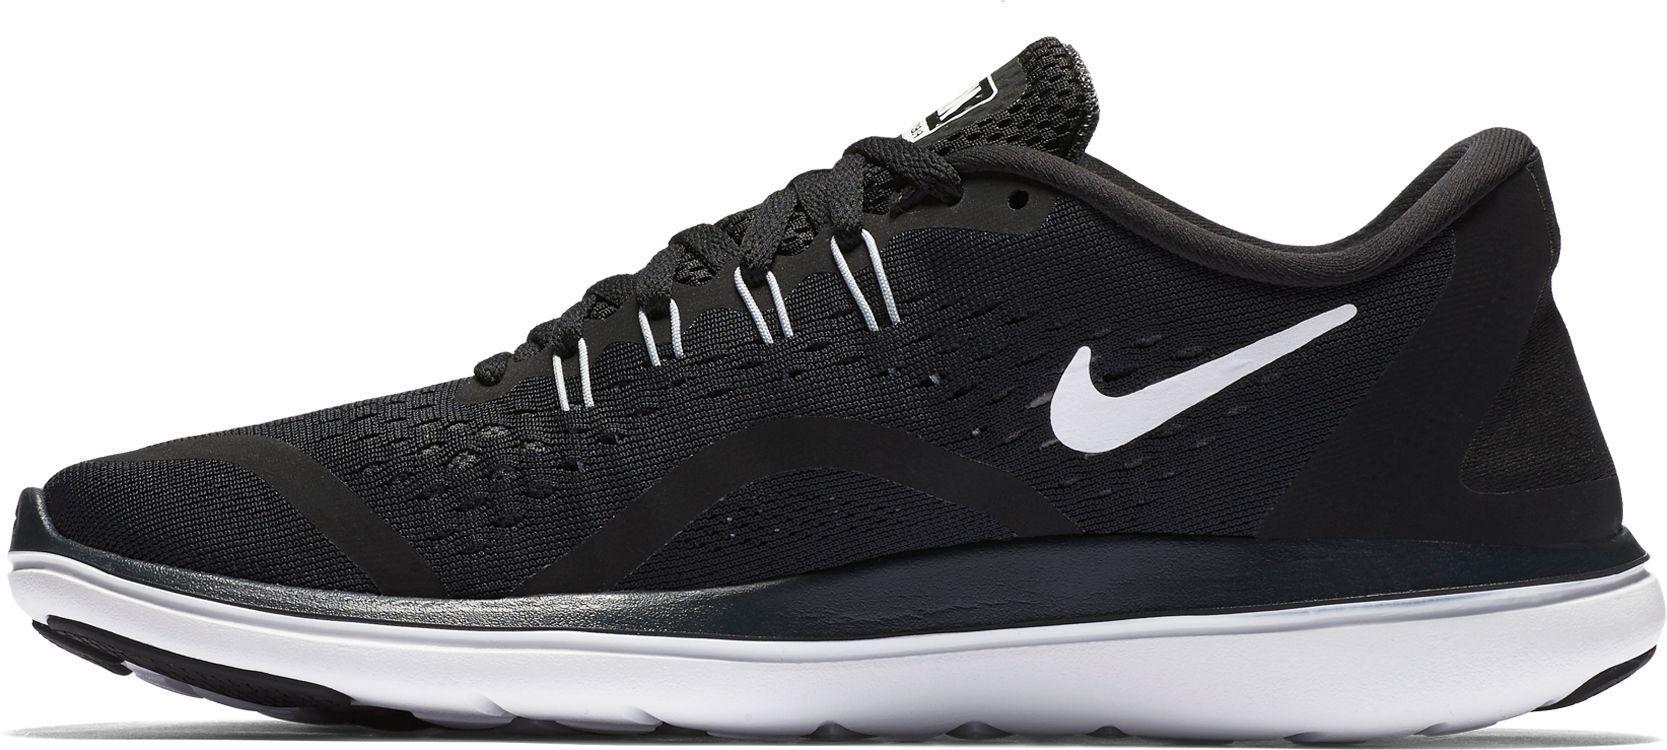 d0df6d4a57e38 Lyst - Nike Flex 2017 Rn Running Shoes in Black for Men